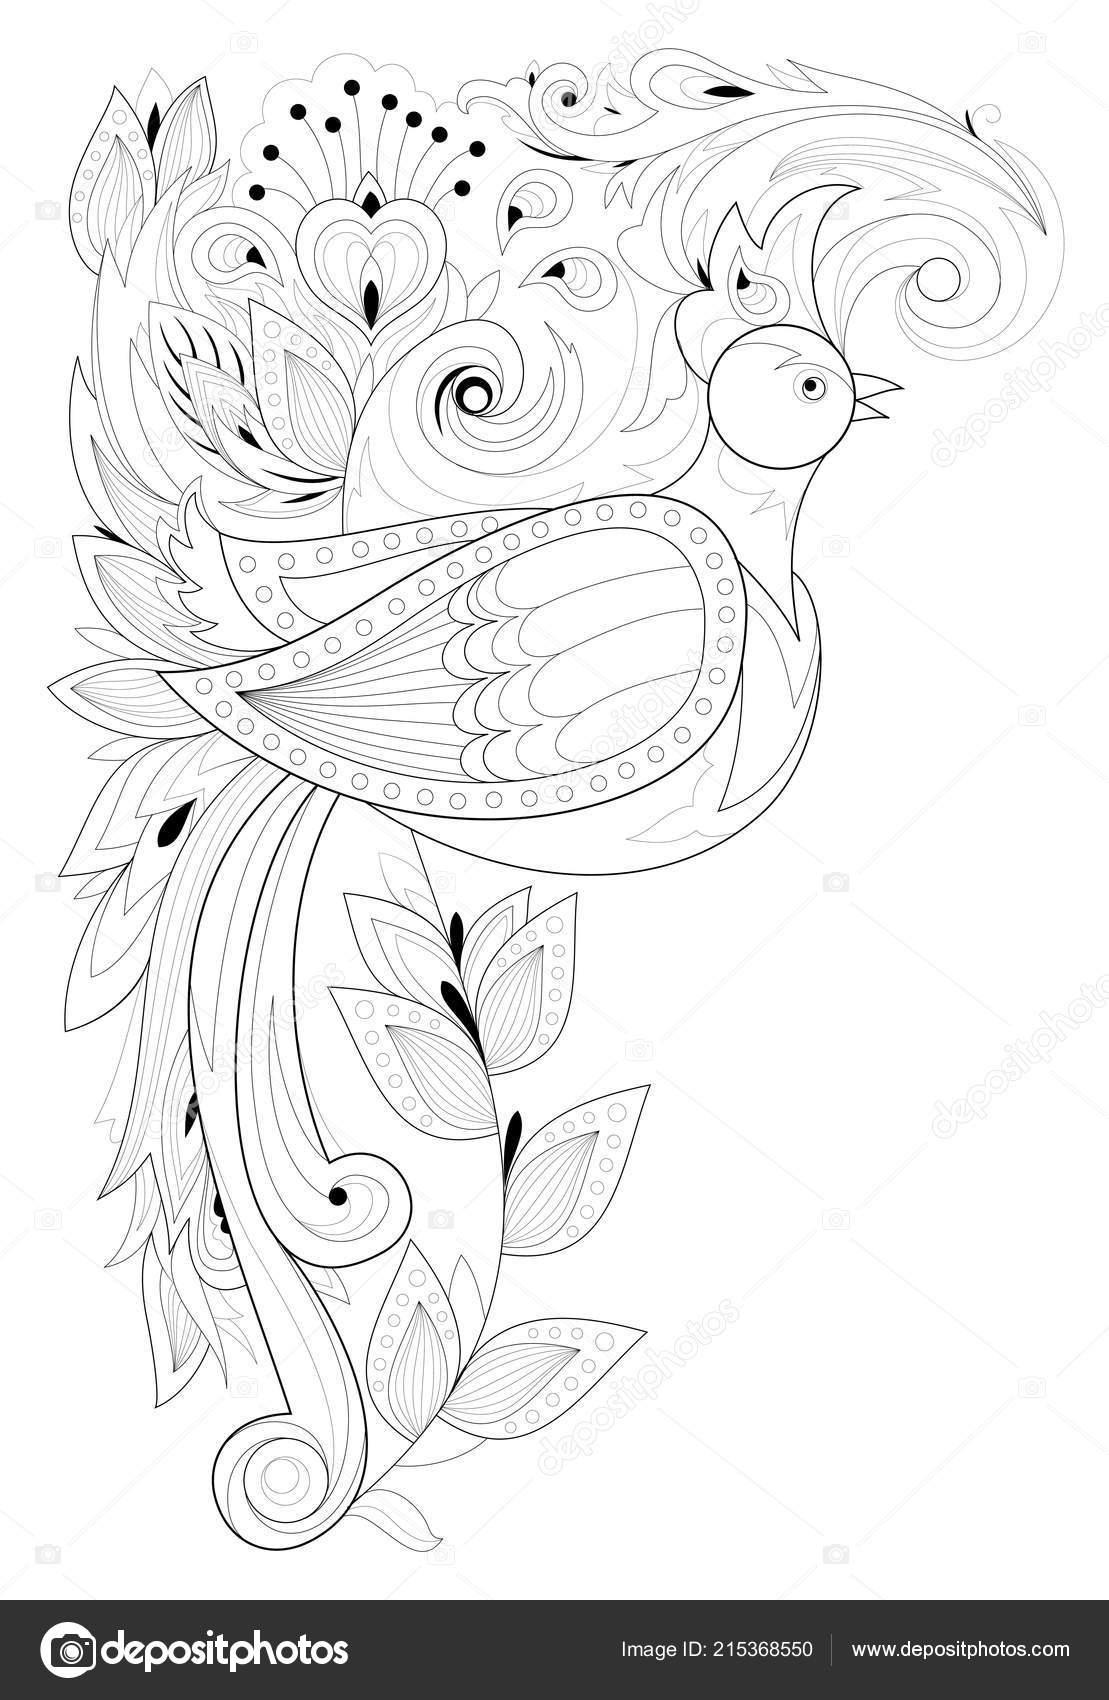 Pagina Para Colorear Blanco Negro Dibujo Flores Aves Del Hermoso